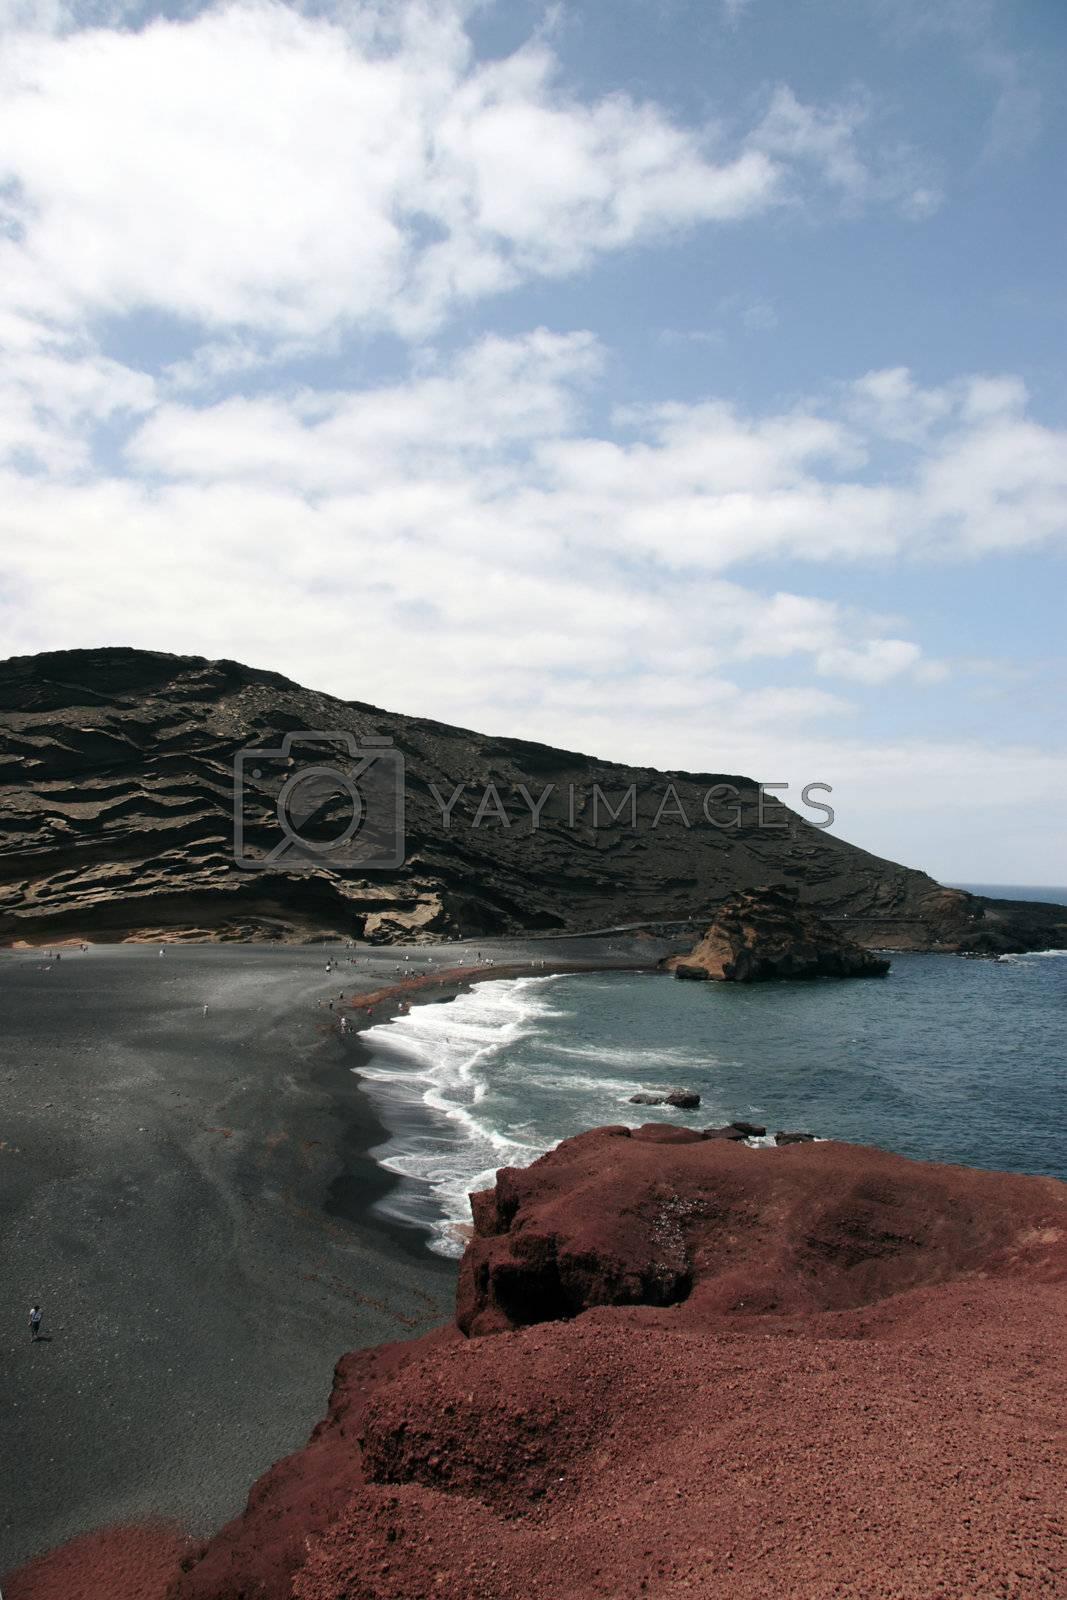 the coast line of a volcanic island